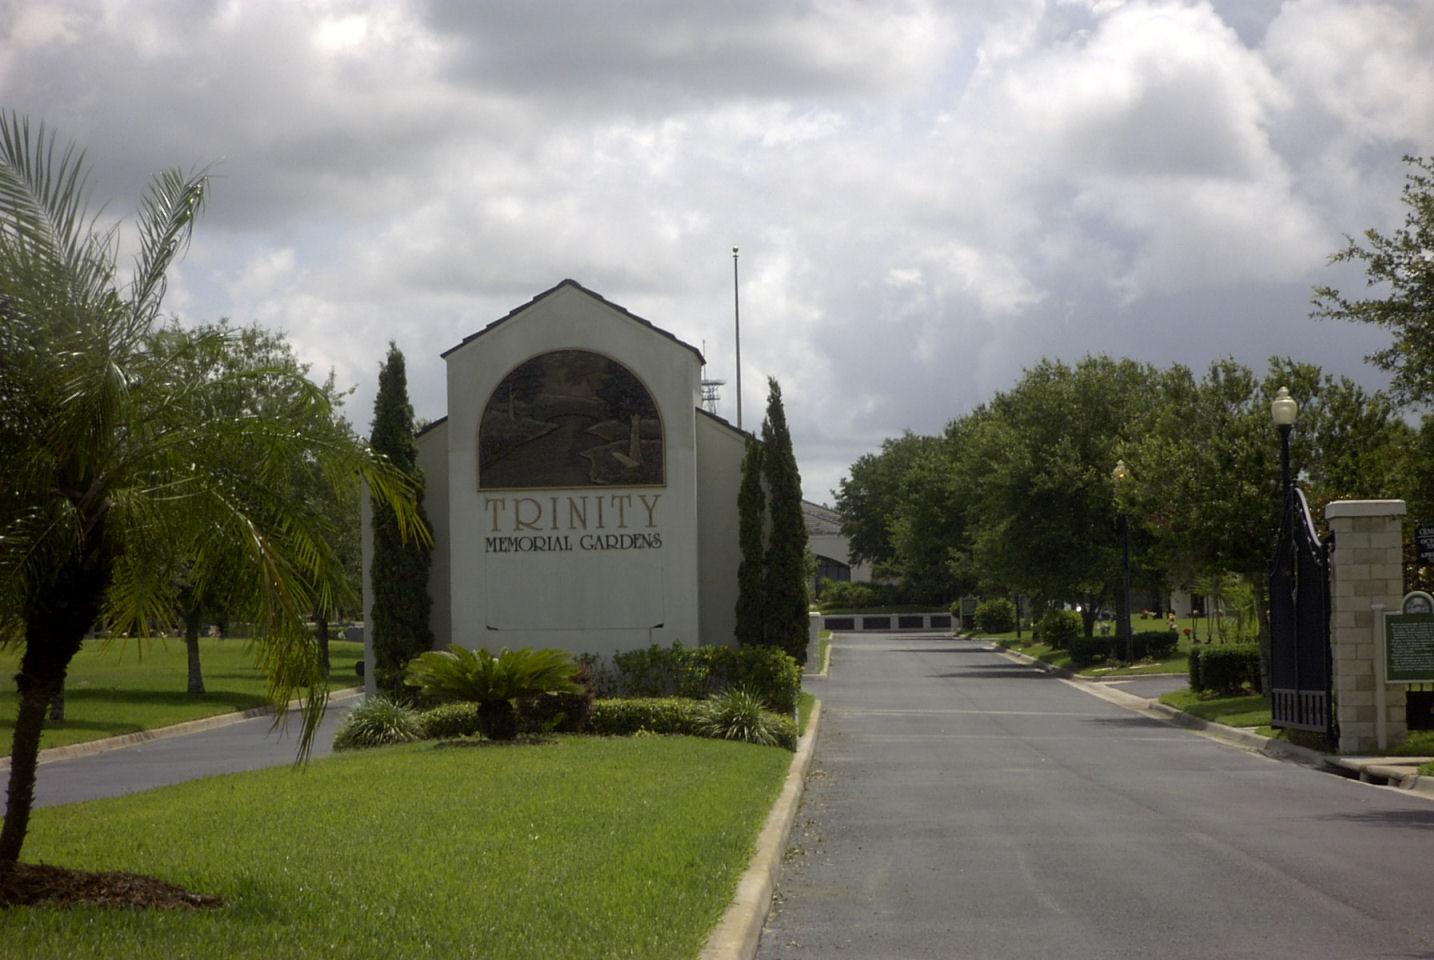 Trinity Memorial Gardens